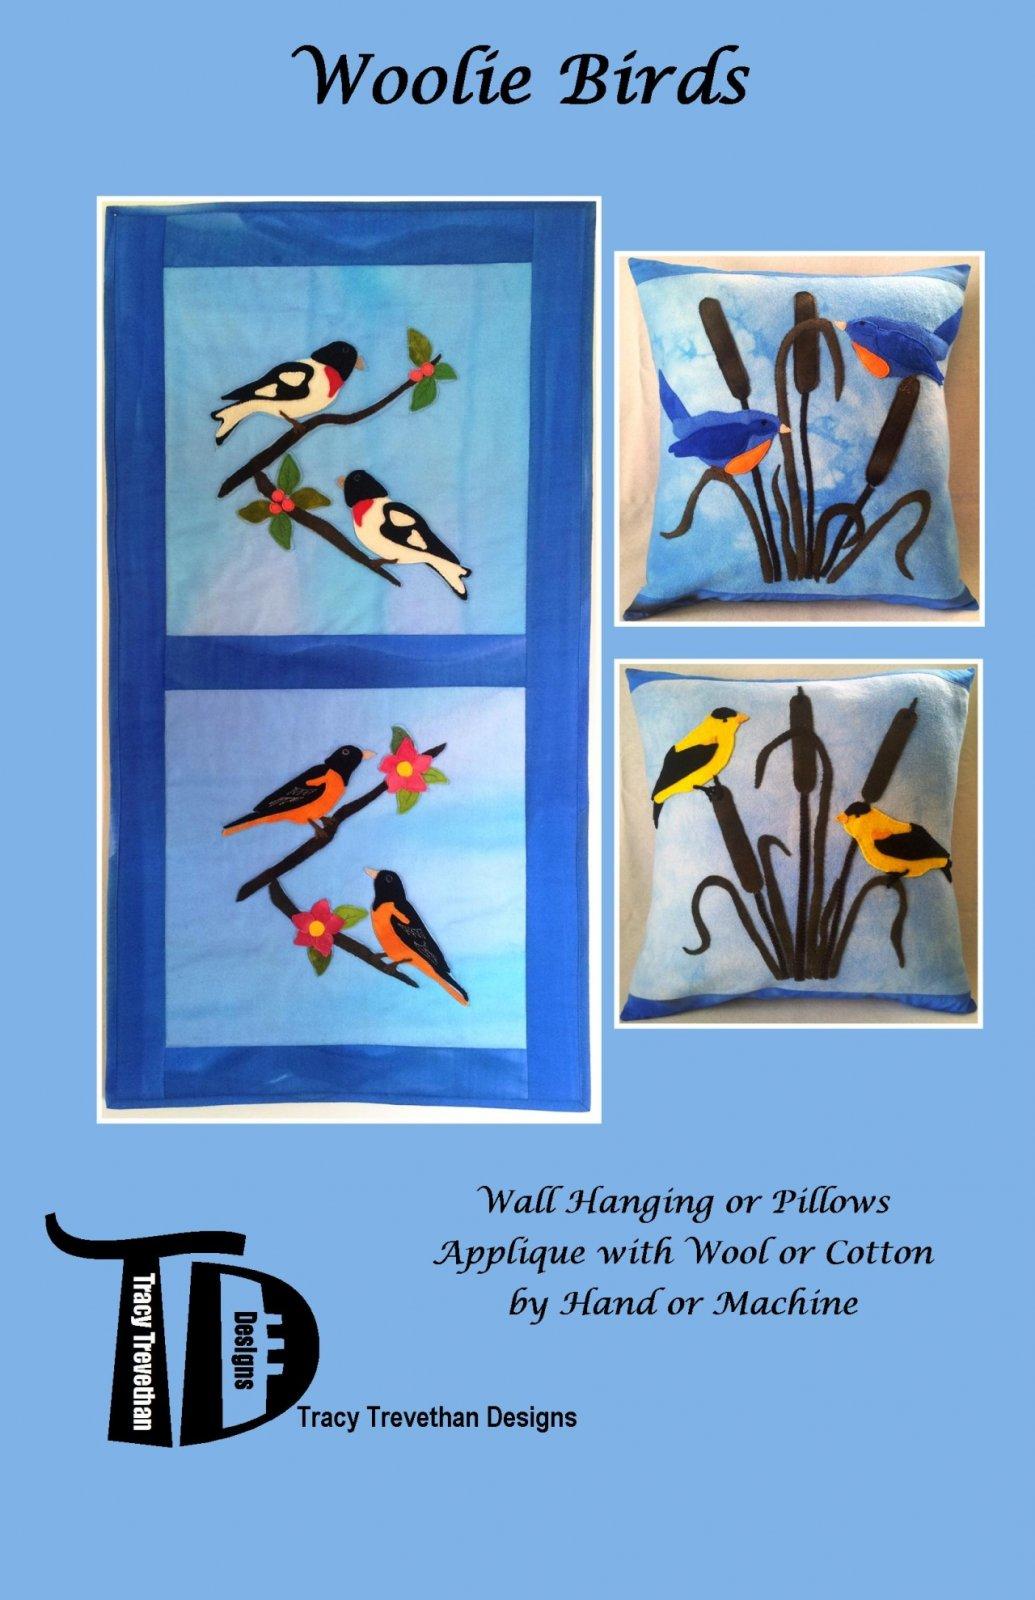 TT135 WOOLIE BIRDS